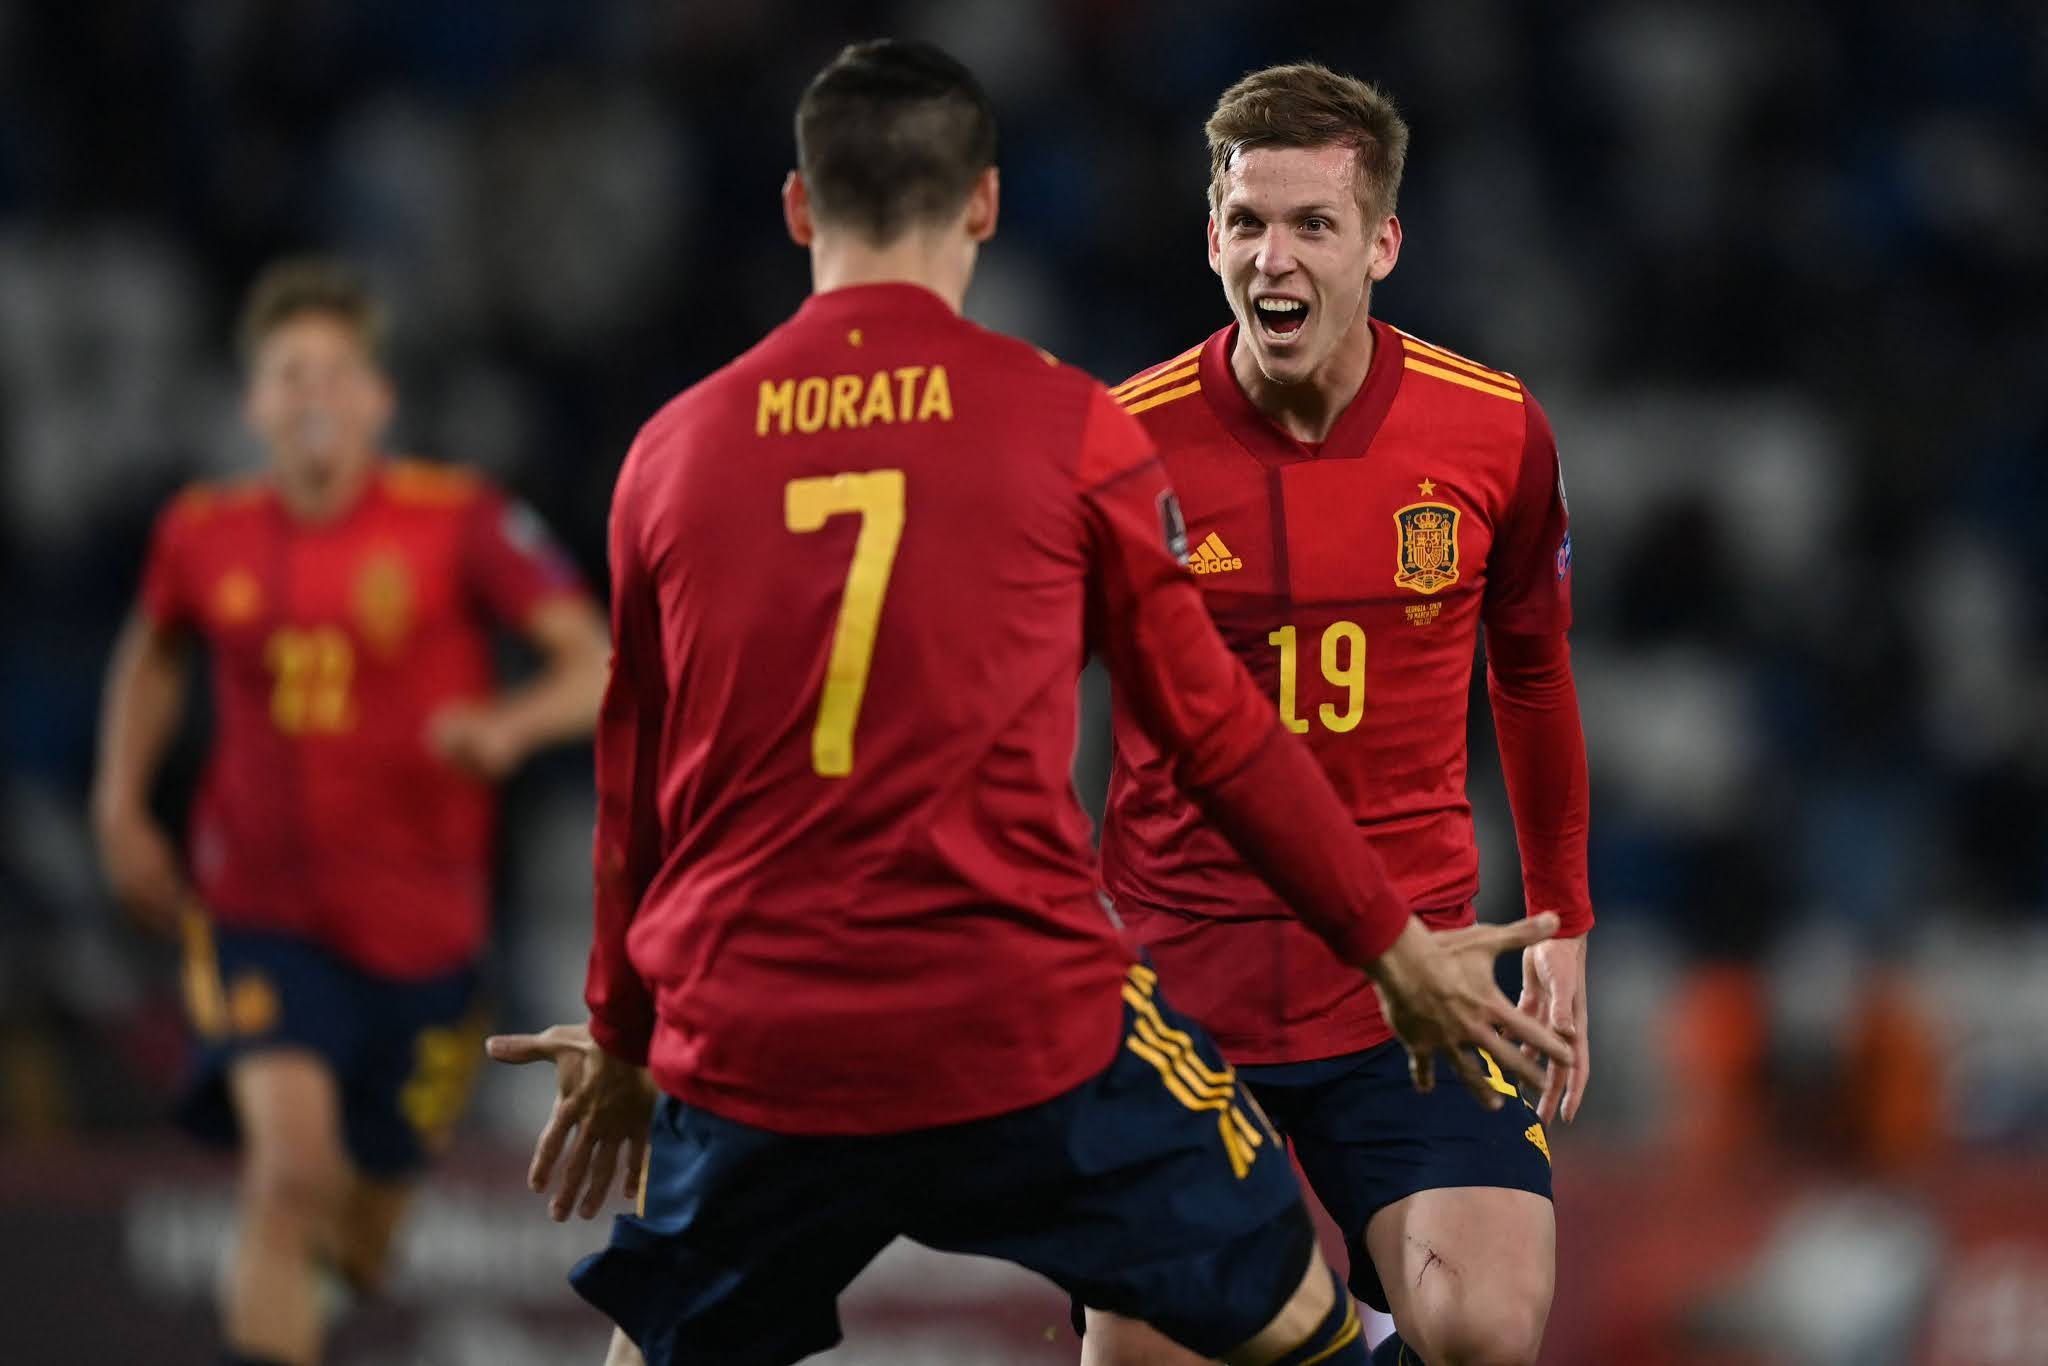 Spain play host to Portugal at Atletico Madrid's Estadio Wanda Metropolitano on Friday night